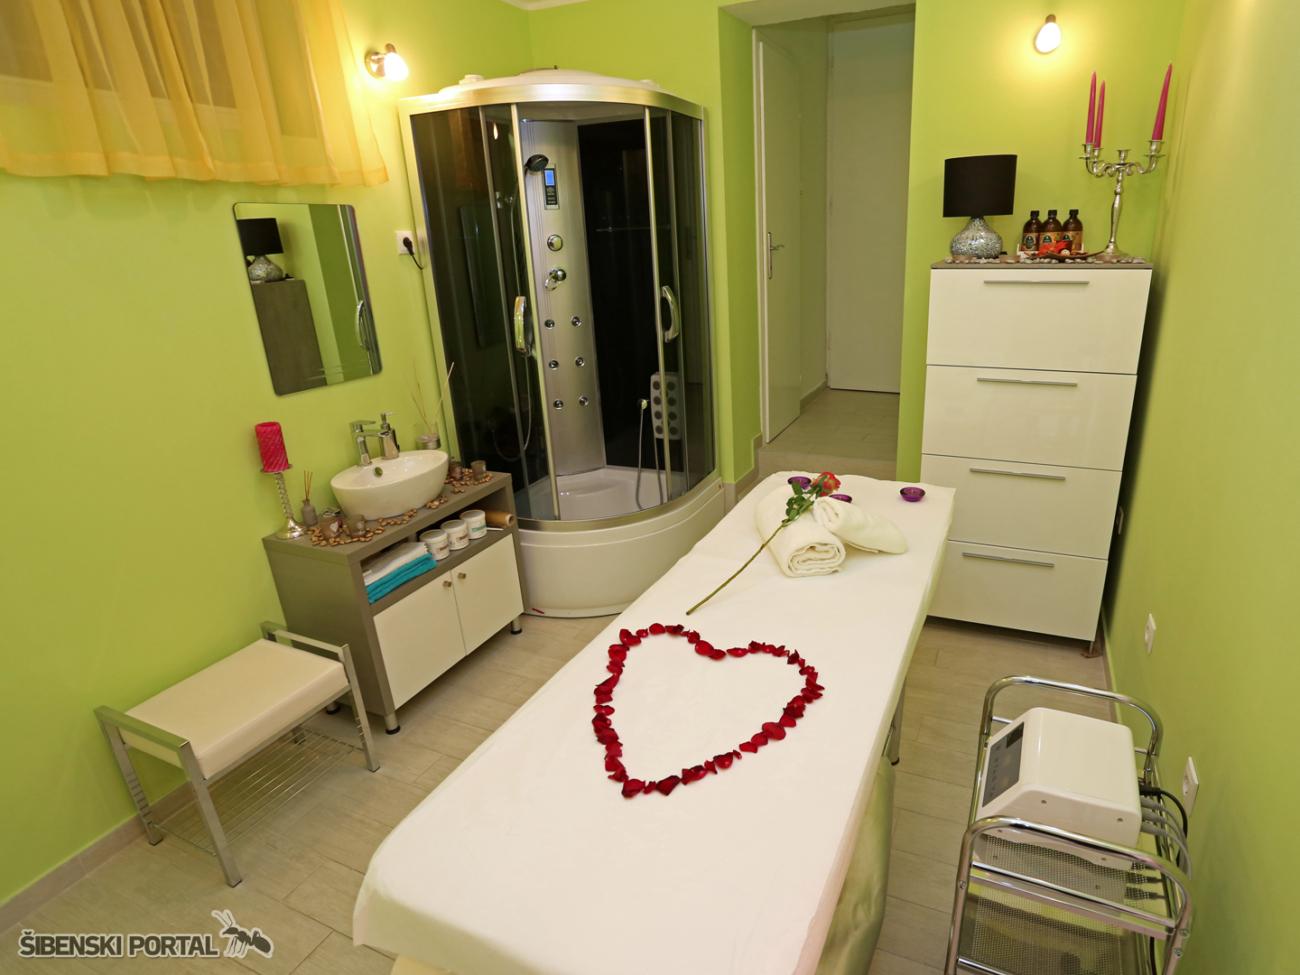 kozmeticki-salon-hypnotic-051216-5